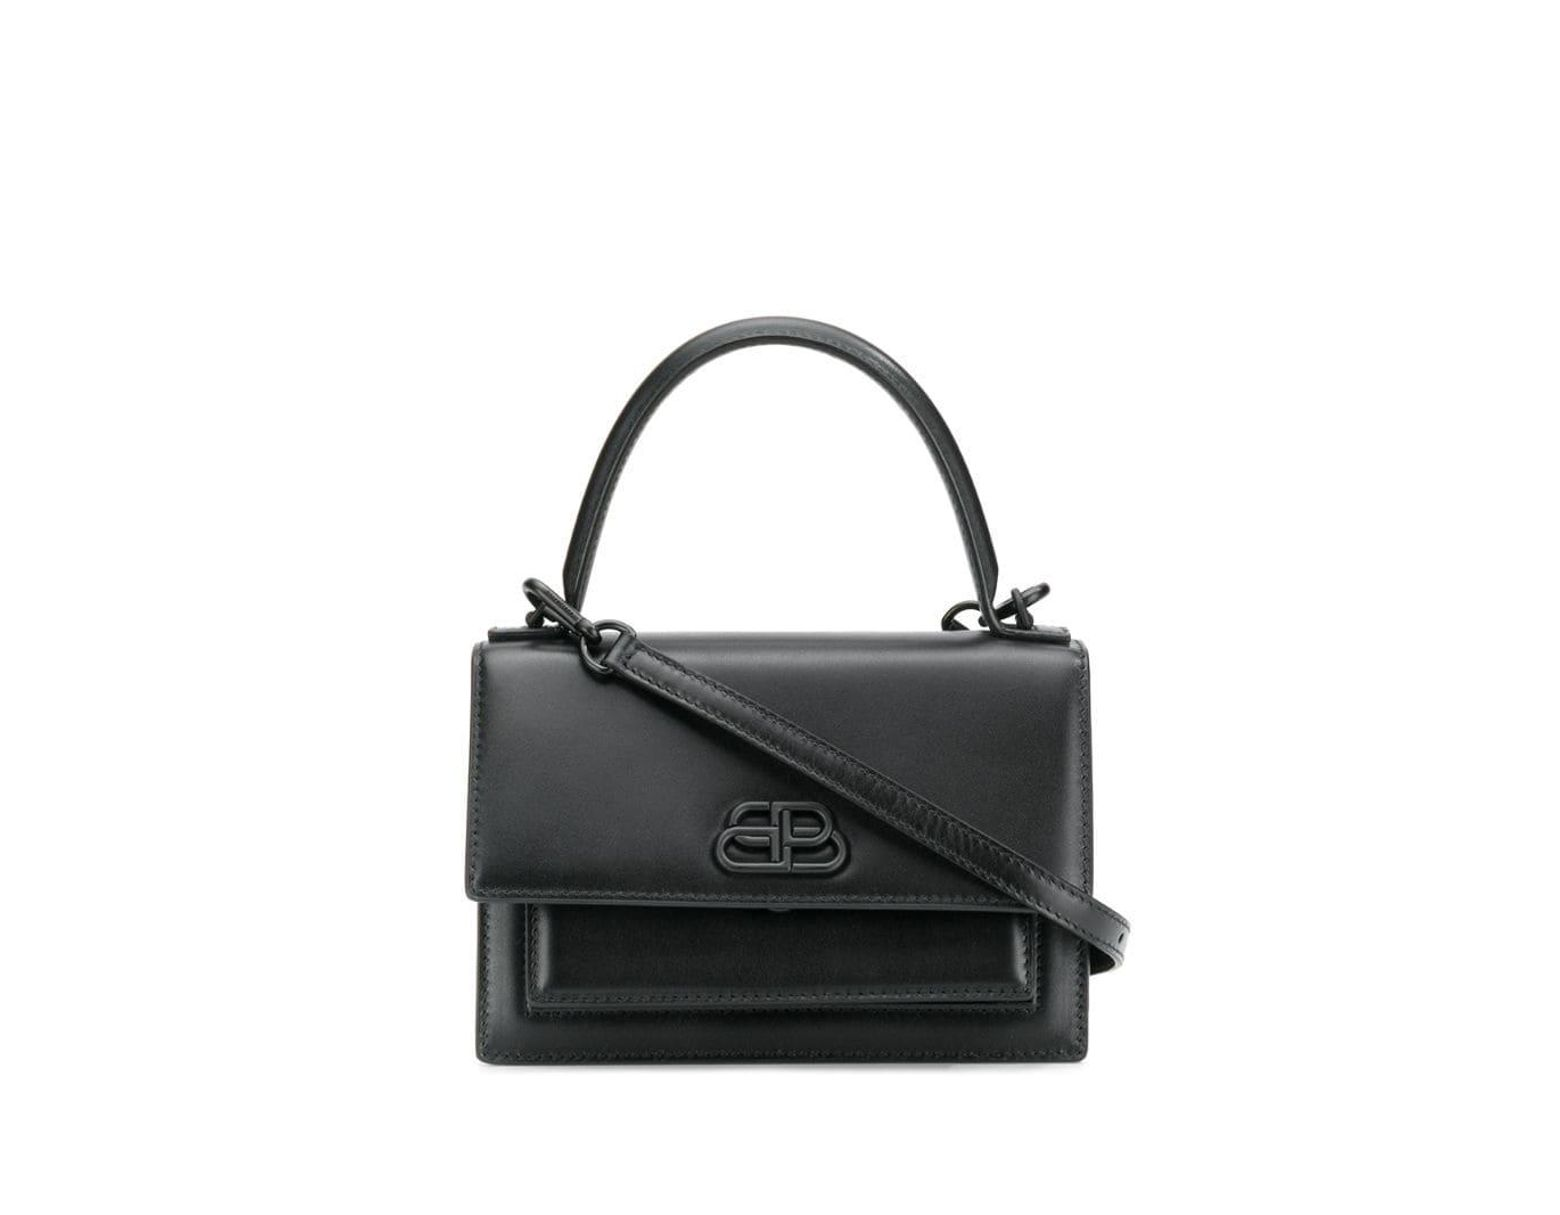 34fc62abd Balenciaga Sharp Bag Xs in Black - Lyst